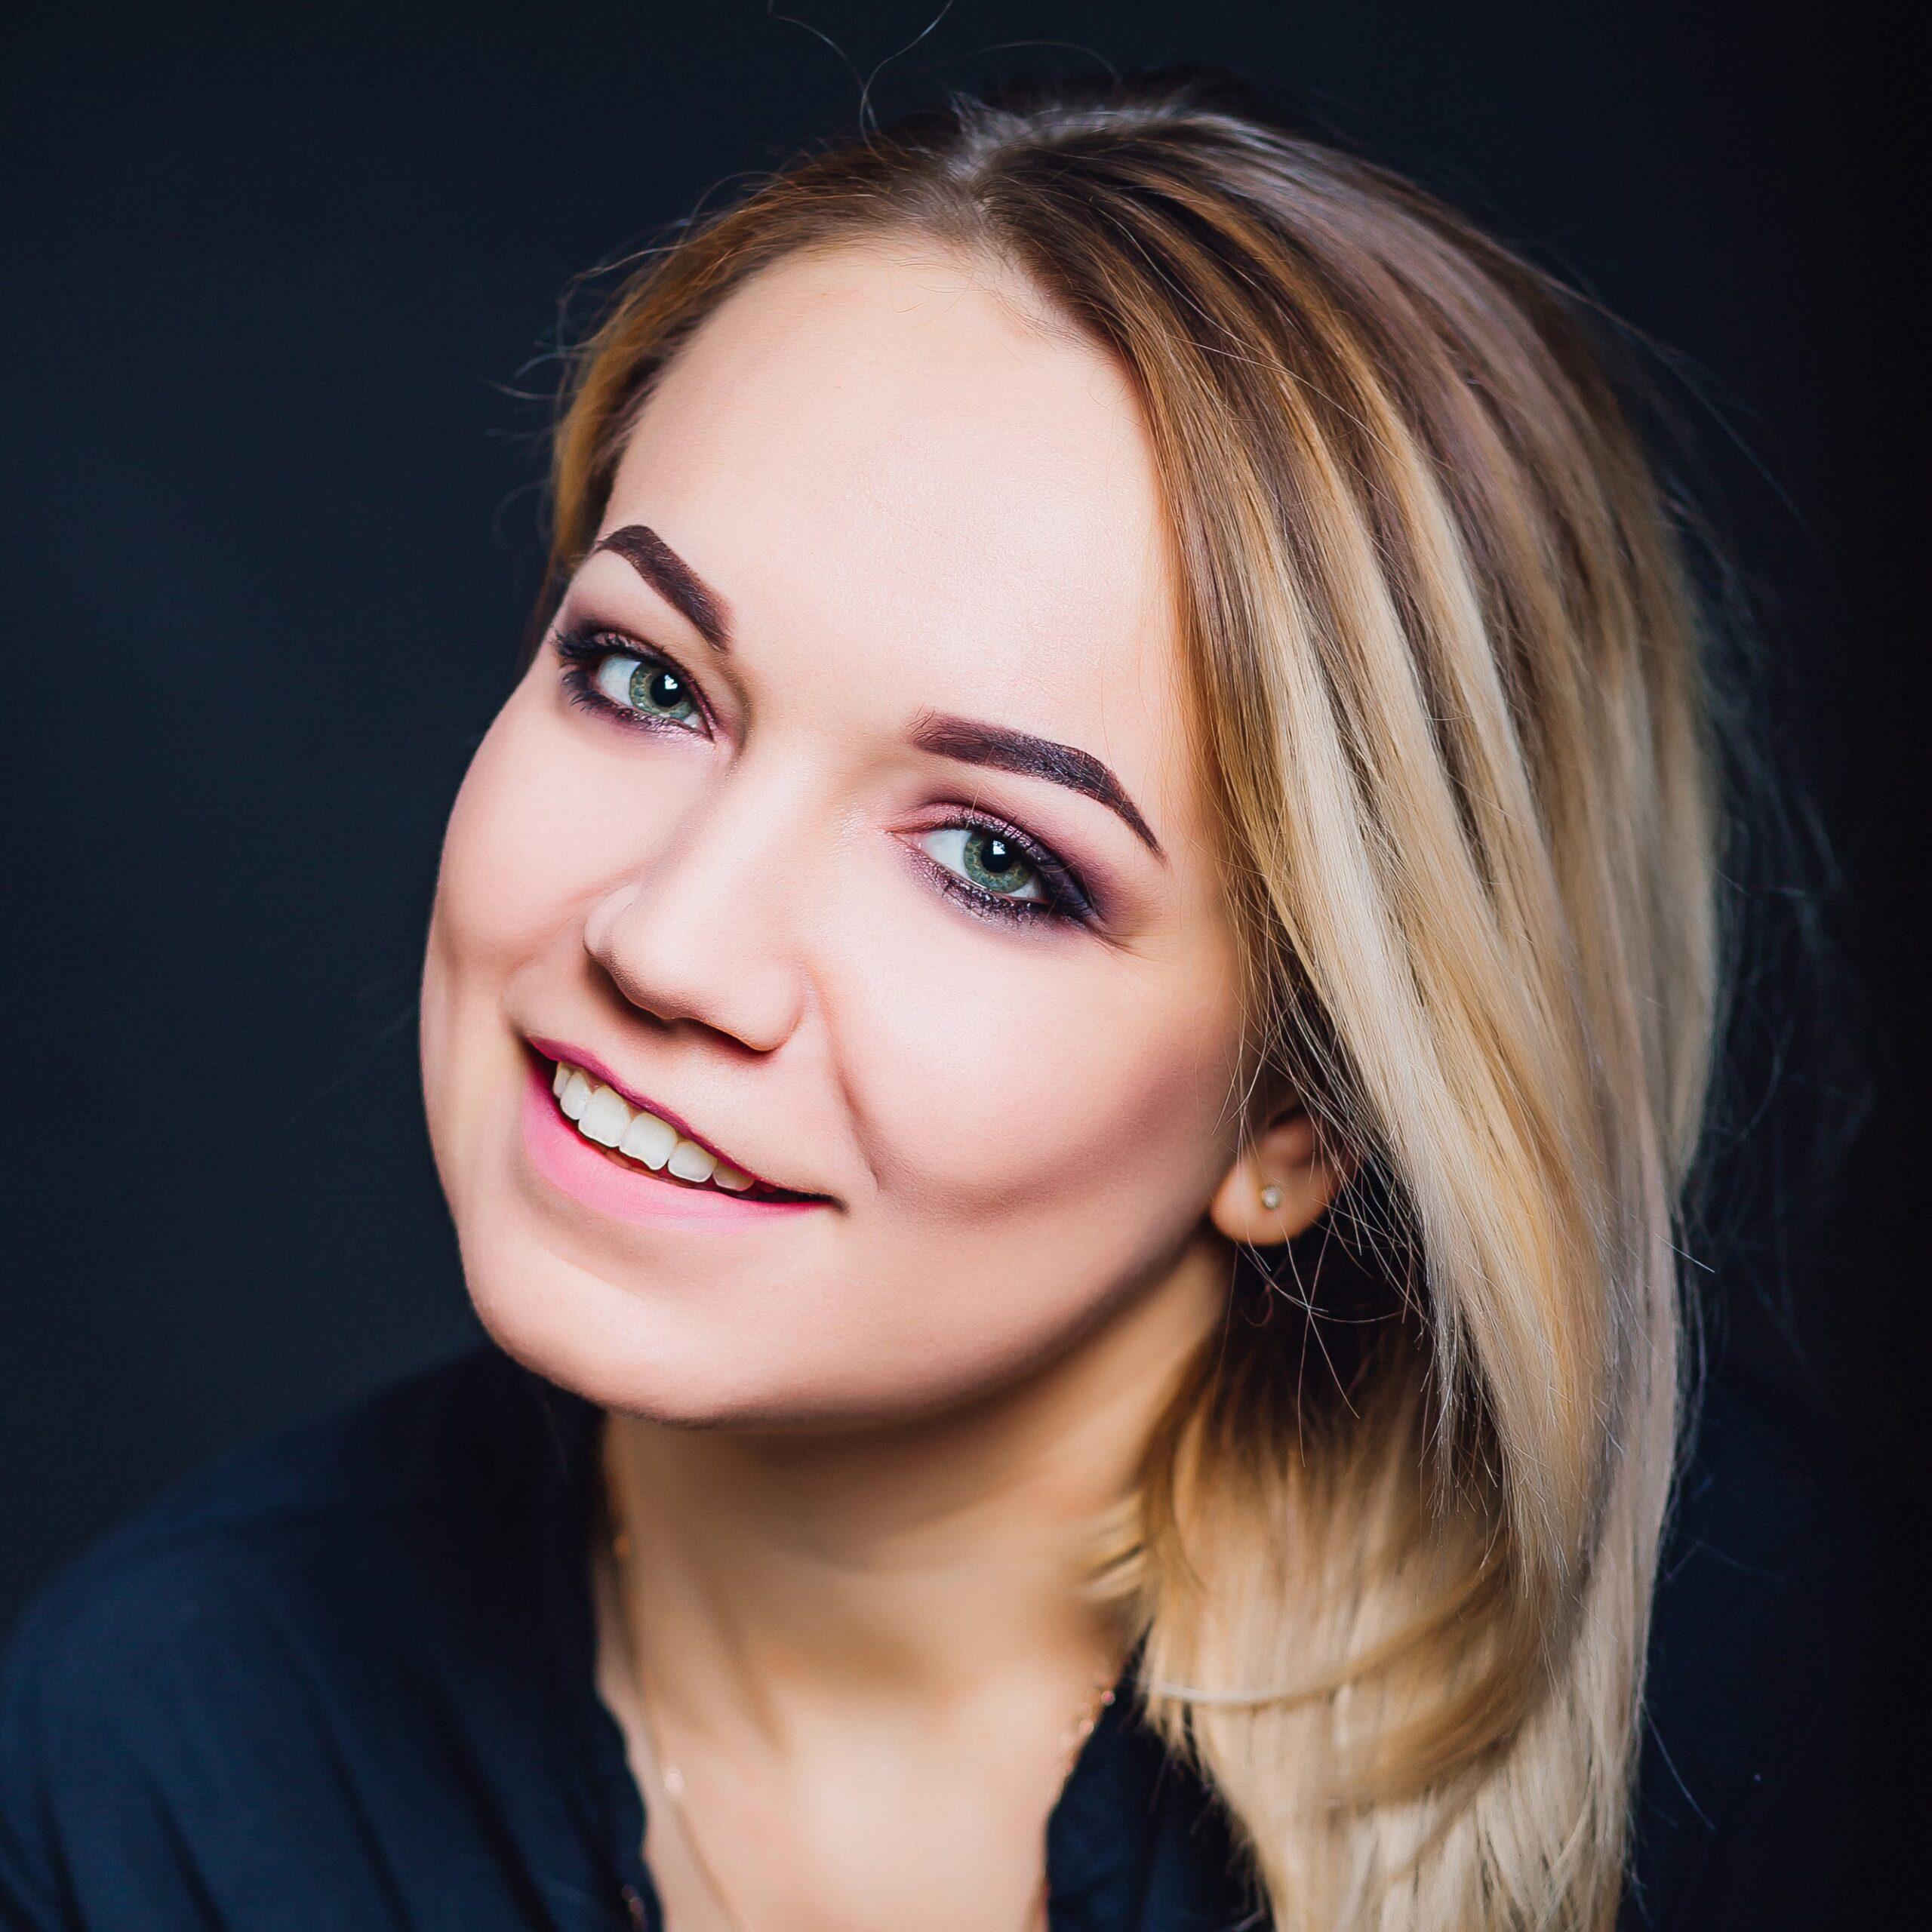 Юлия Валентиновна Храмченкова